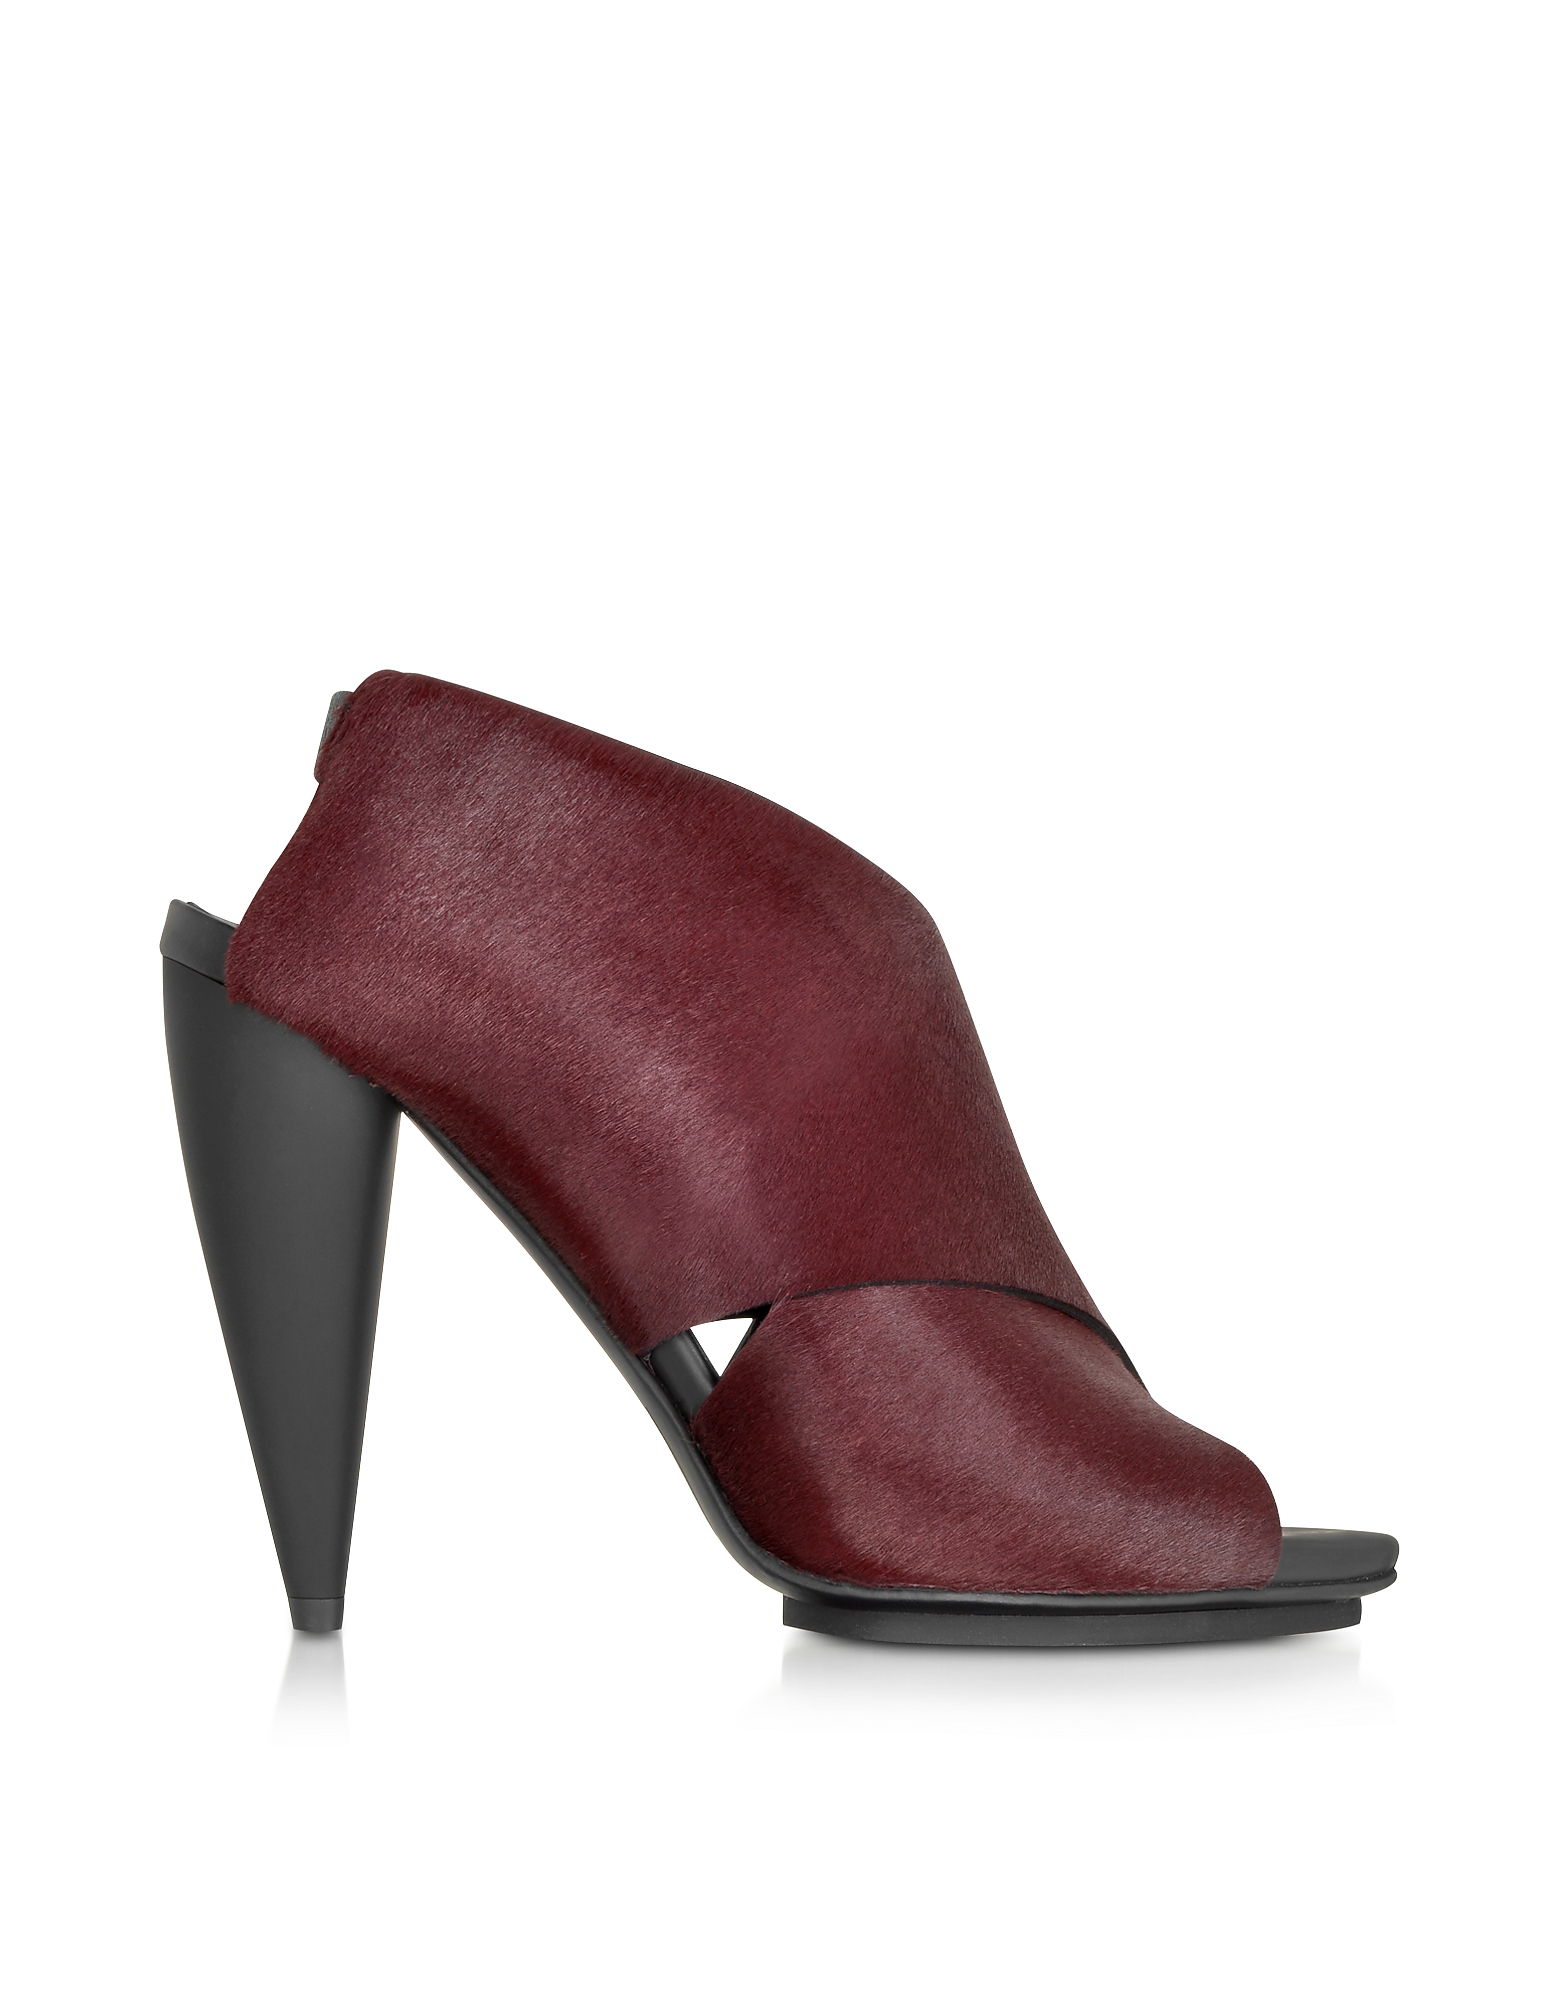 Proenza Schouler Designer Shoes, Bordeaux Kebir Haircalf Slingback Sandal